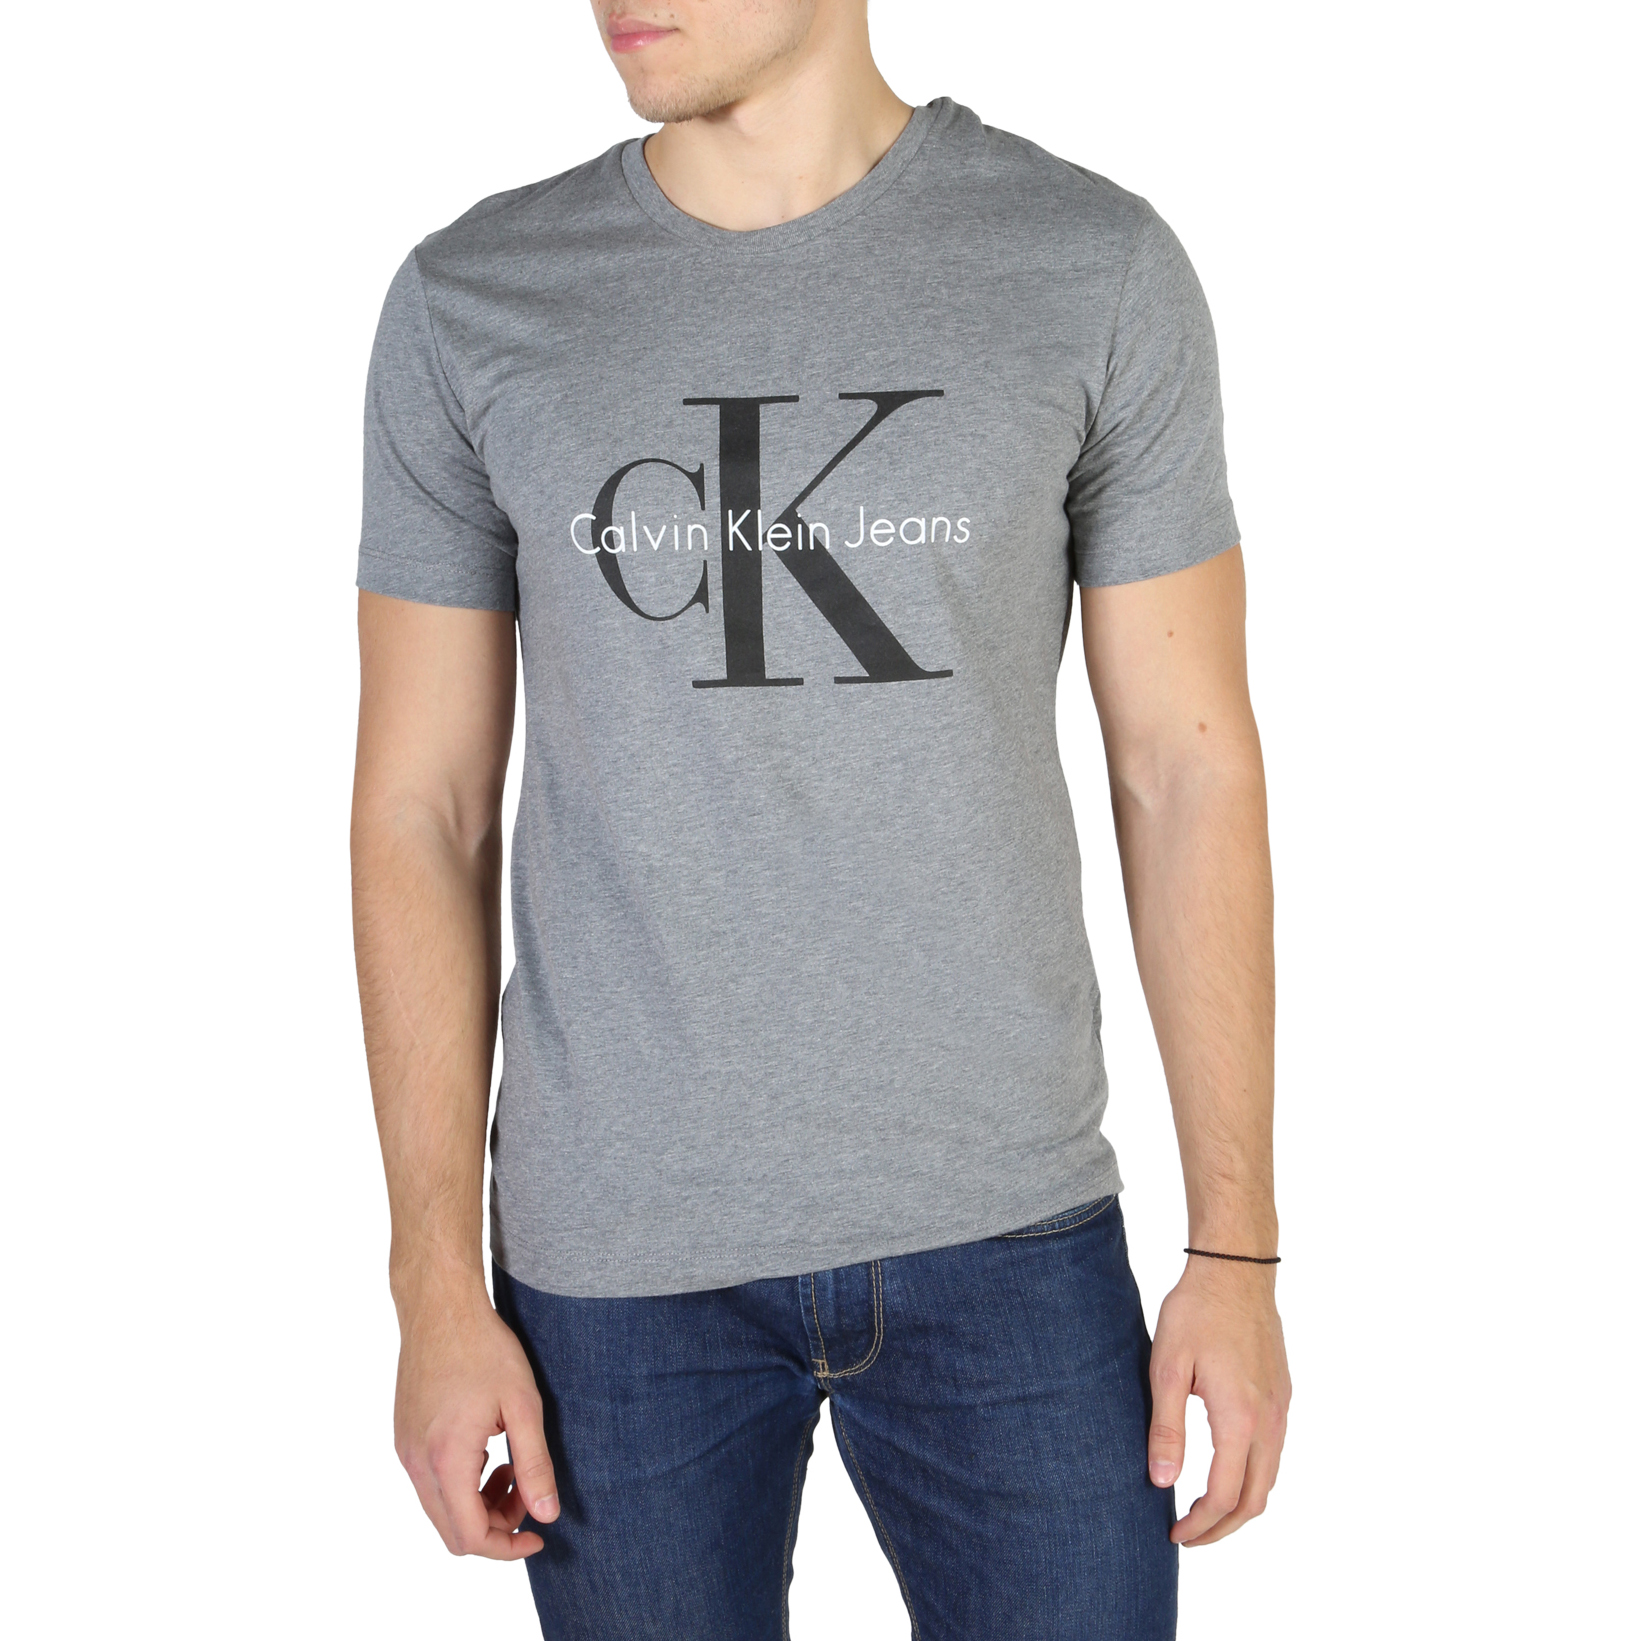 20323-Calvin-Klein-J3IJ302251-Uomo-Grigio-104159-Calvin-Klein